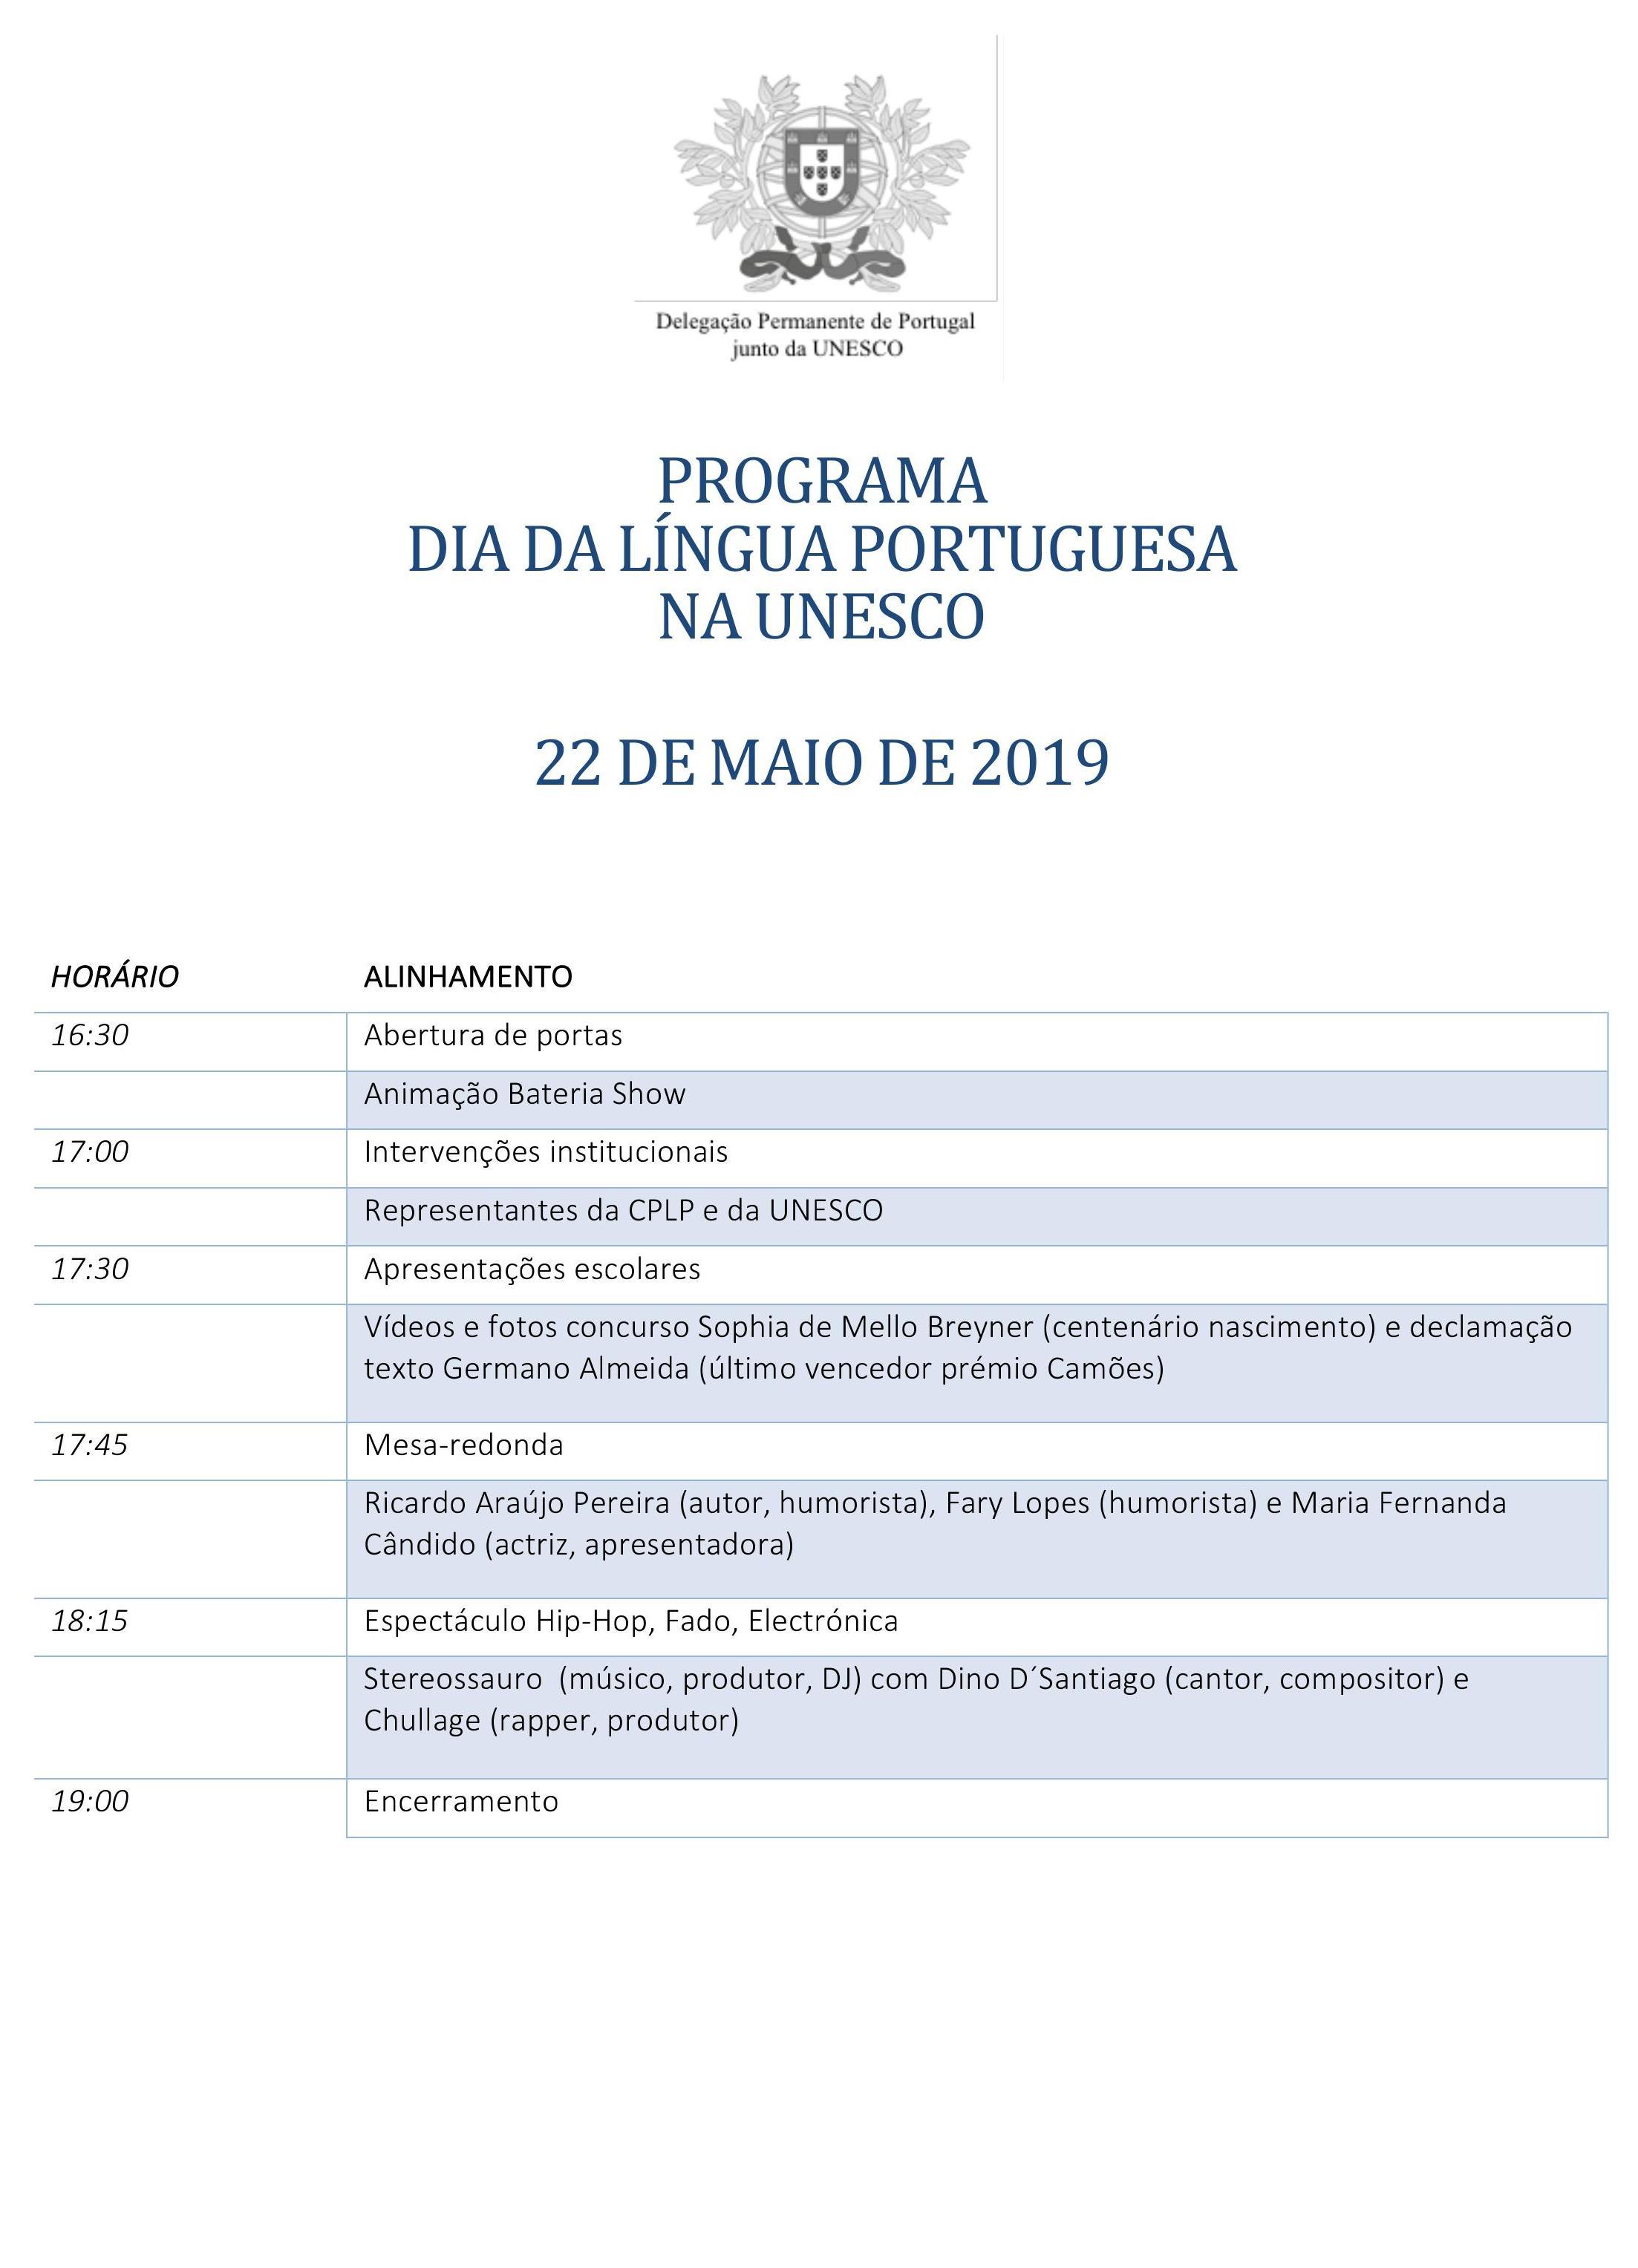 Programa DLP UNESCO 2019